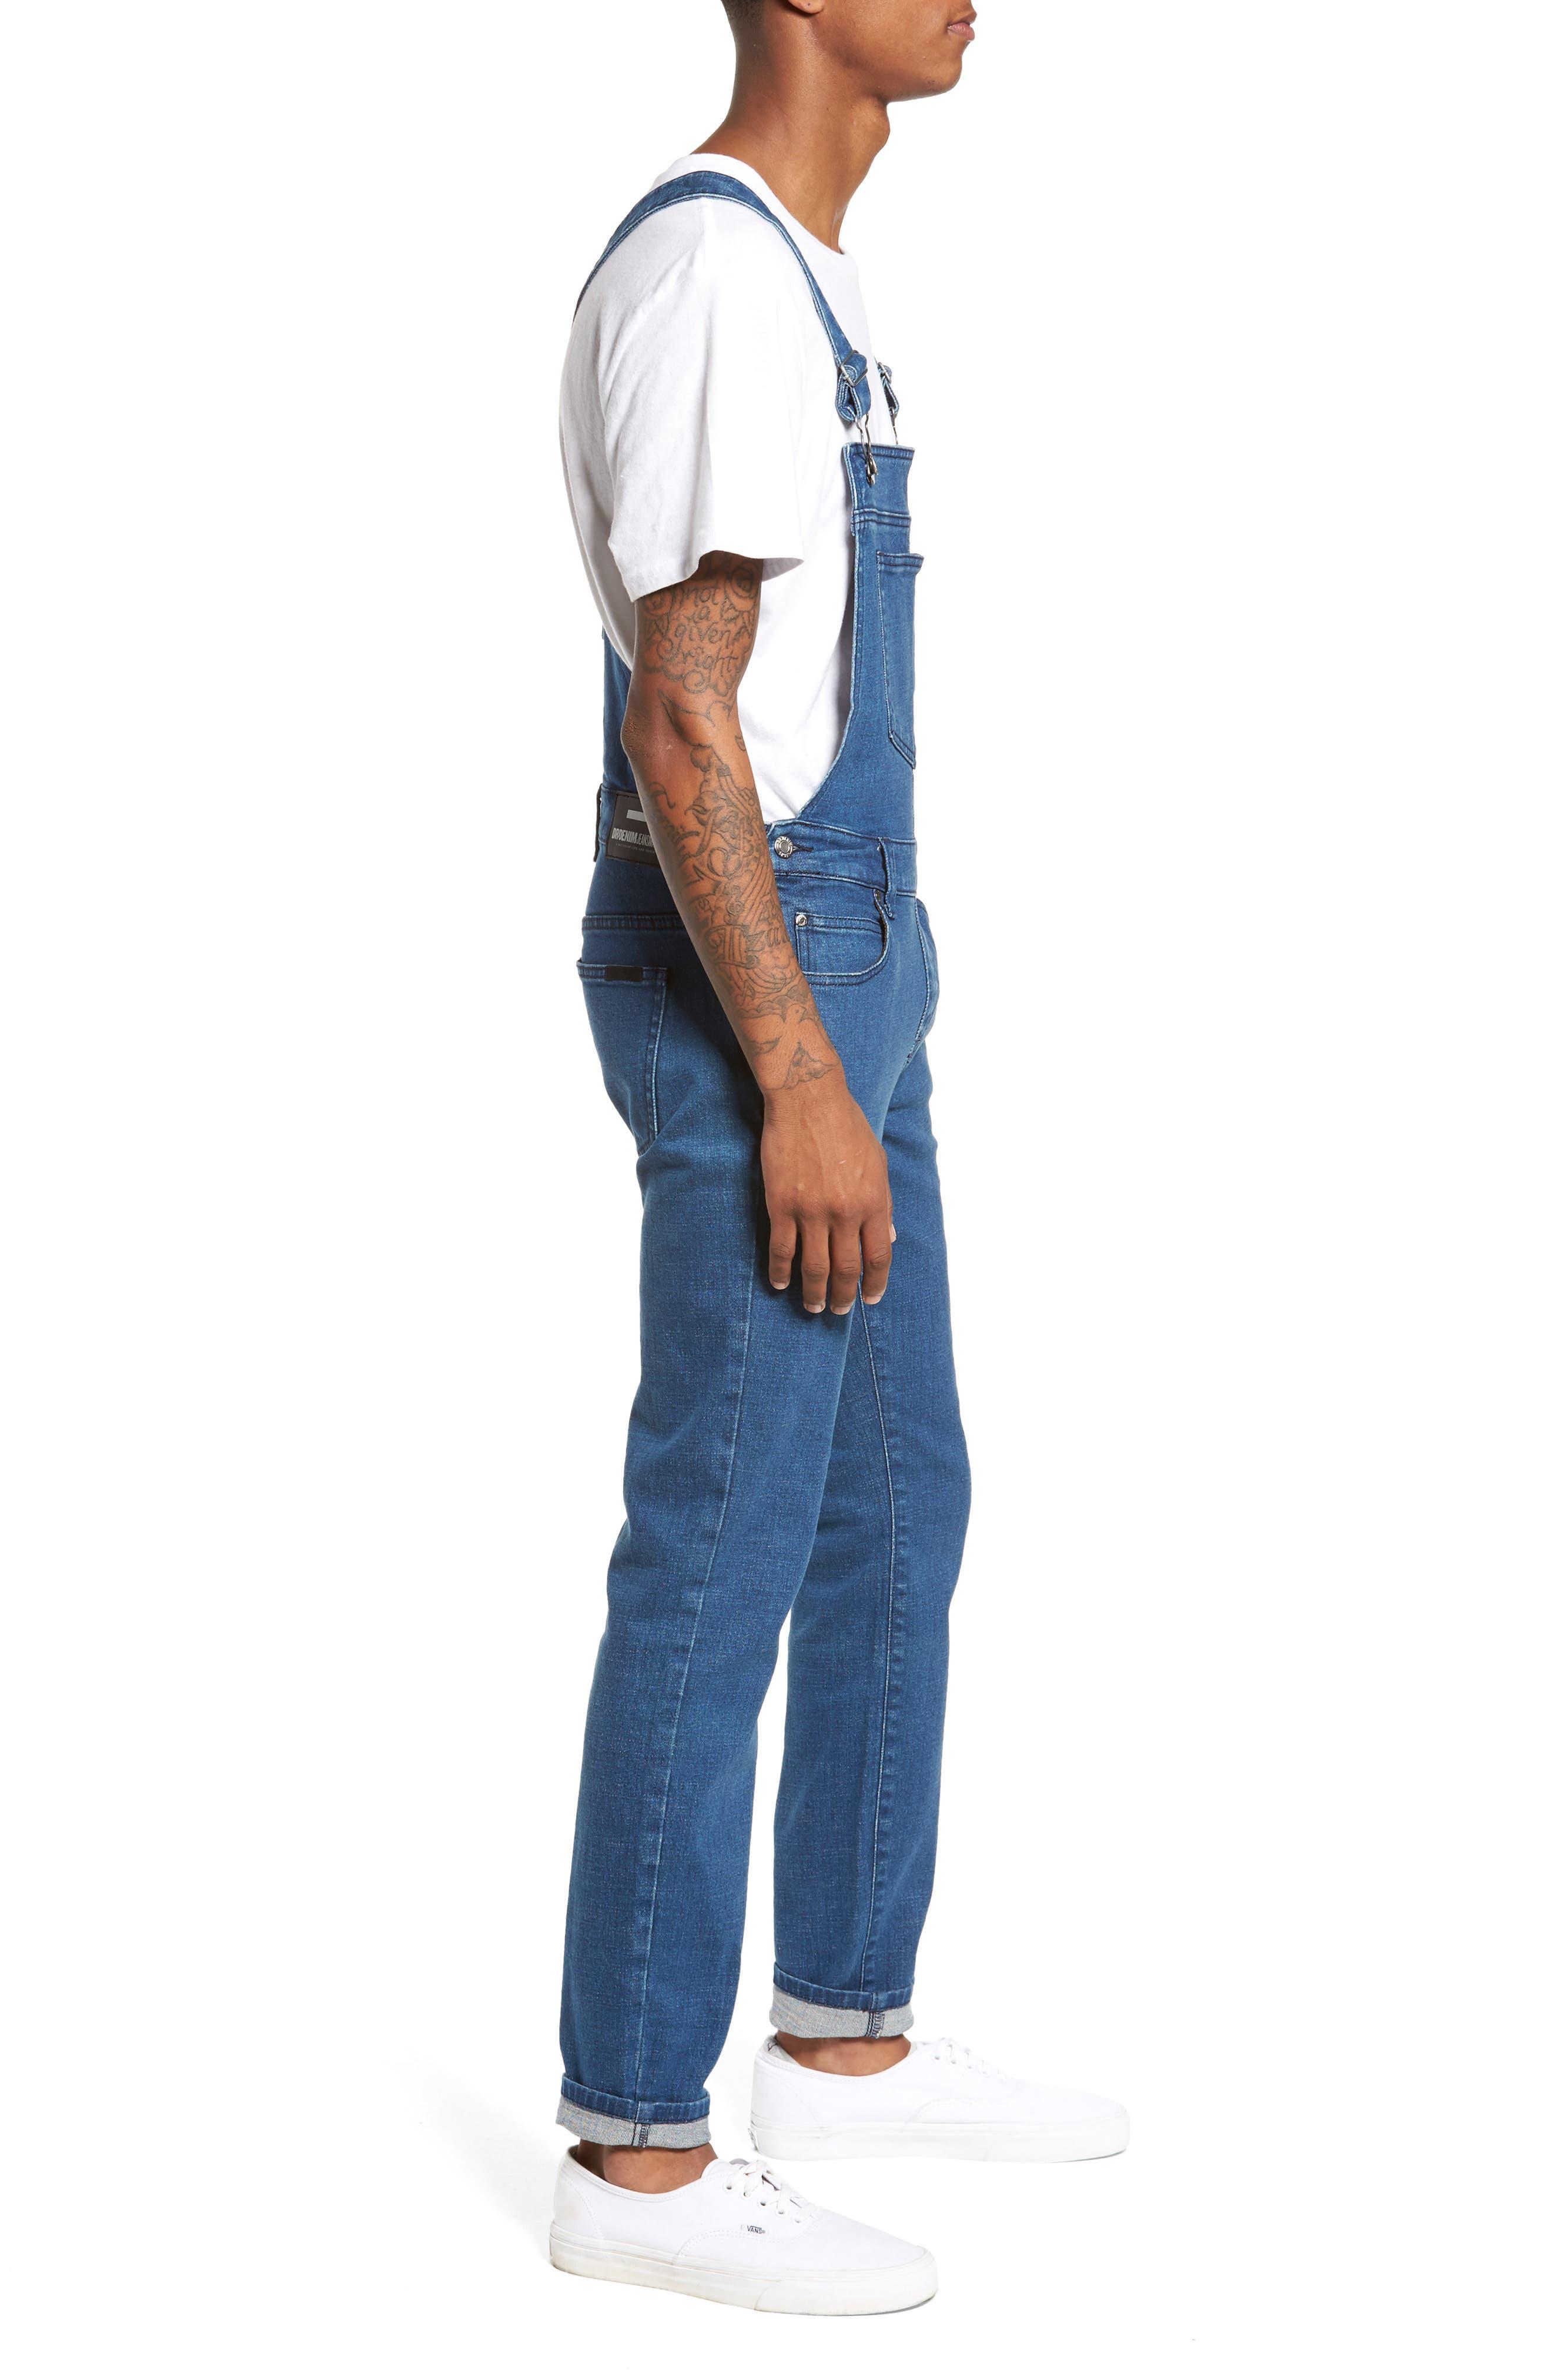 Alternate Image 3  - Dr. Denim Supply Co. Ira Skinny Fit Overalls (90s Mid Stone)